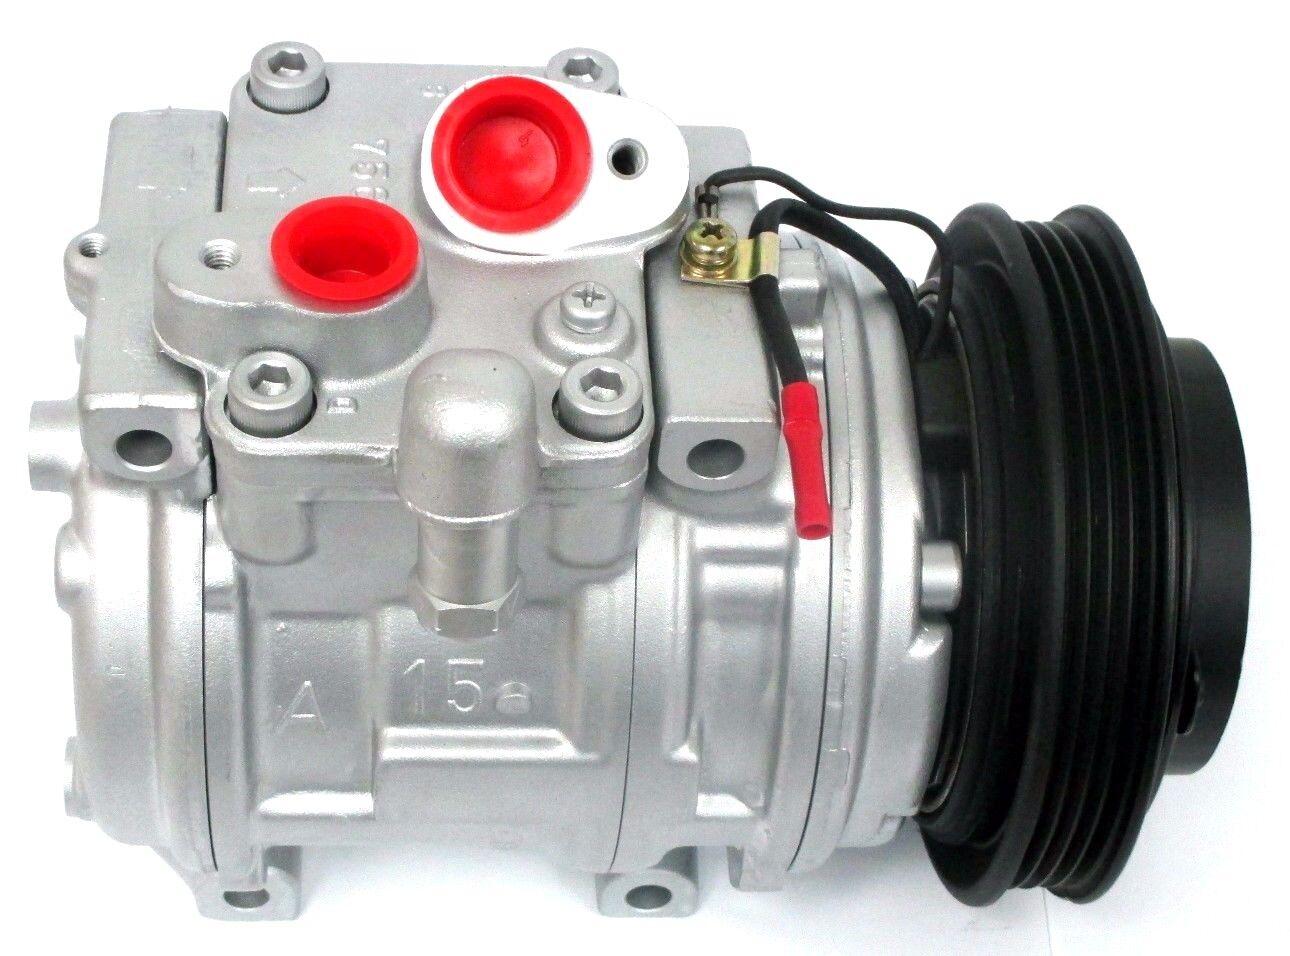 A//C Compressor Kit Fits Acura Integra 1994-2001 10PA15C 67366